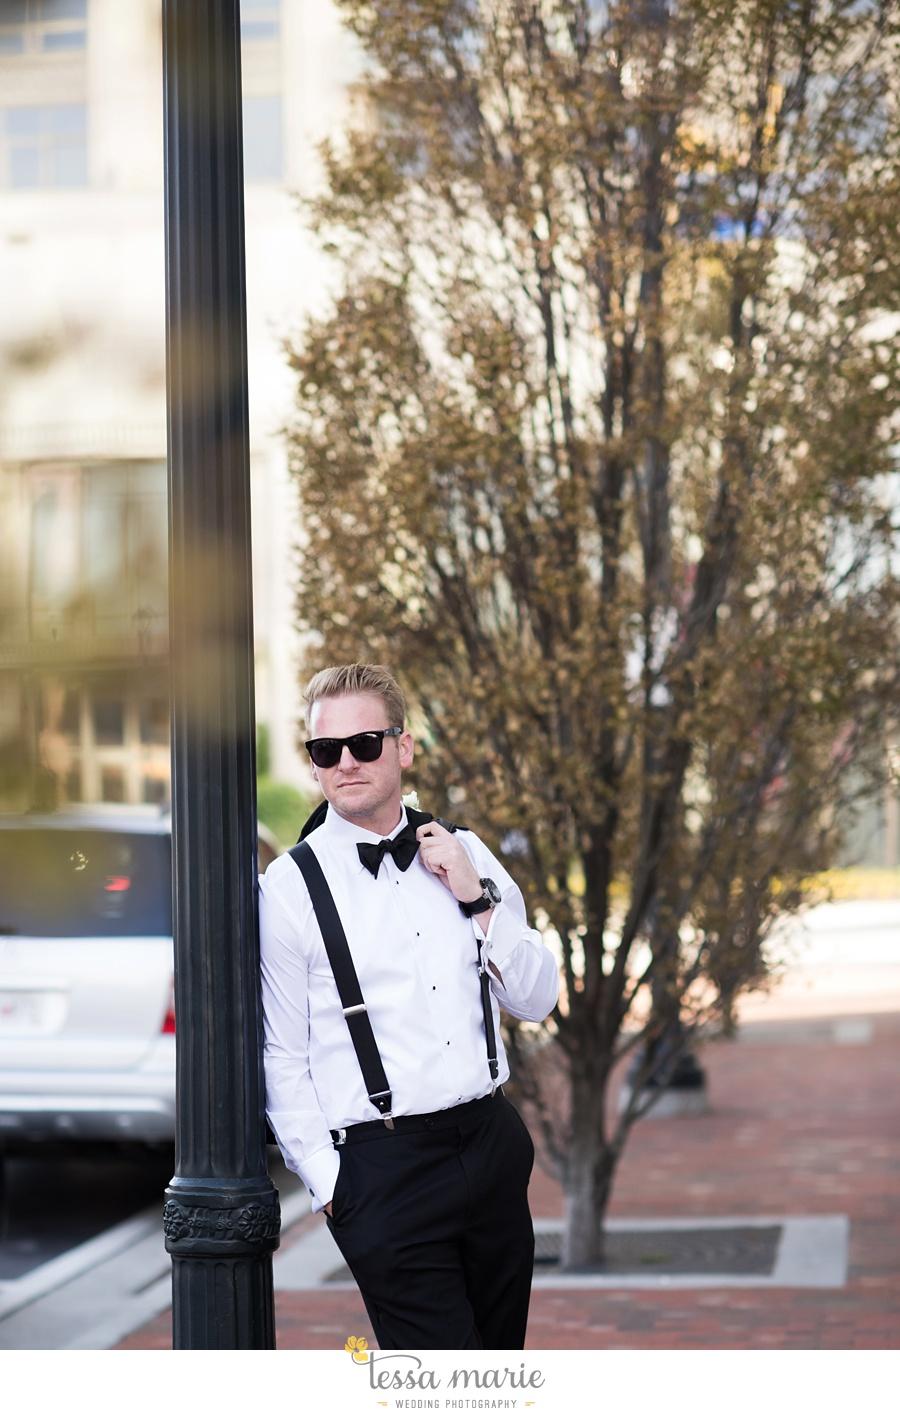 137_tessa_marie_weddings_emotional_moments_photography_king_low_wedding_sam_neil_best_atlanta_wedding_photographer